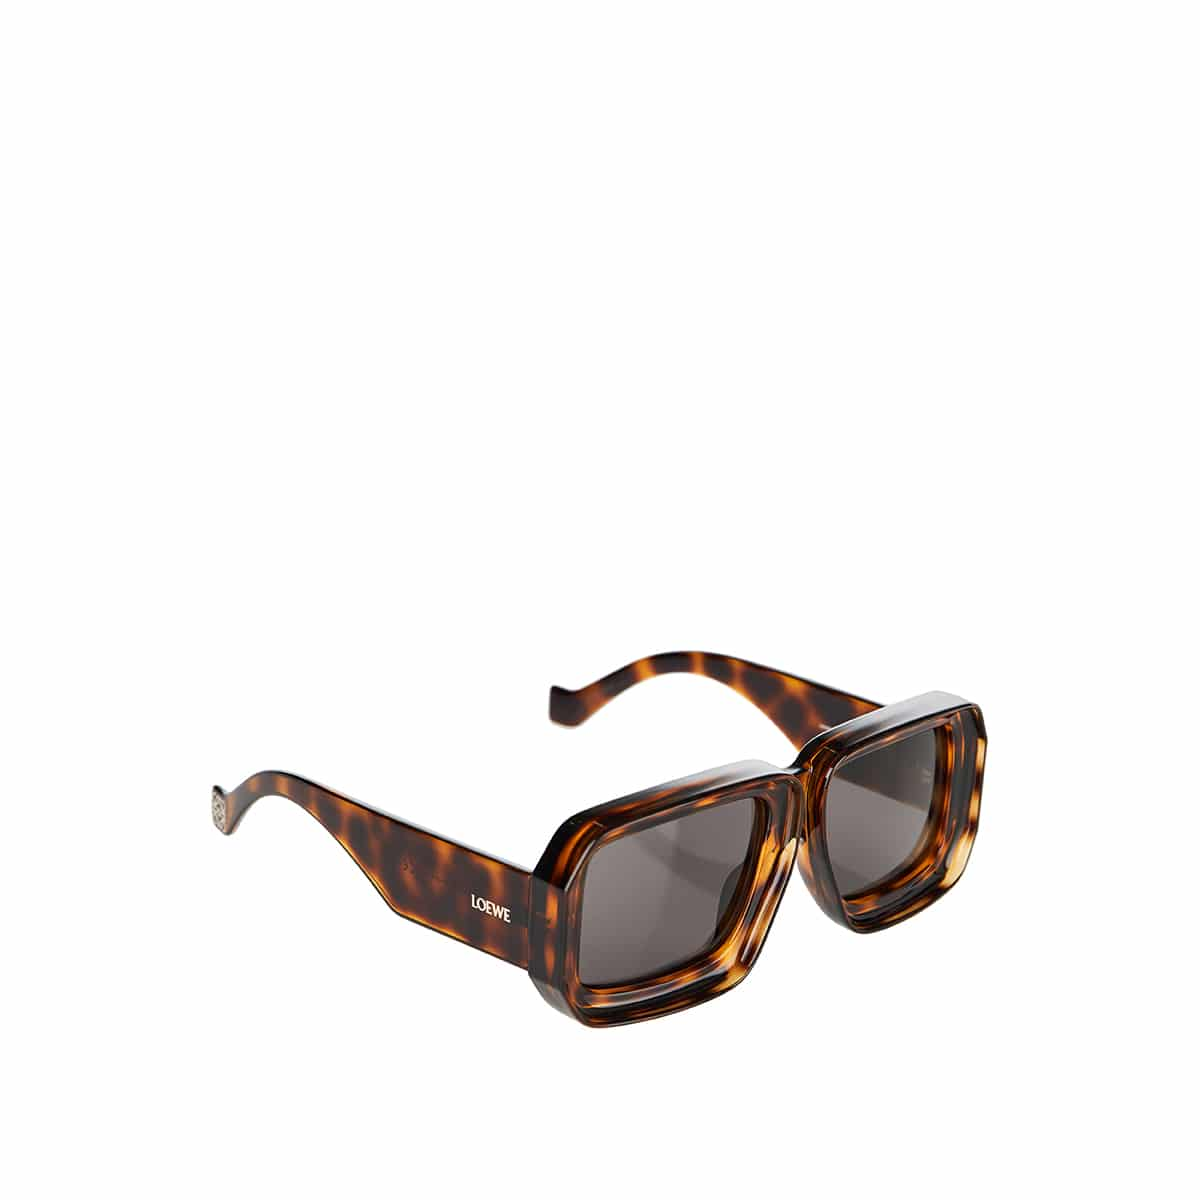 Paula's Ibiza dive in mask sunglasses